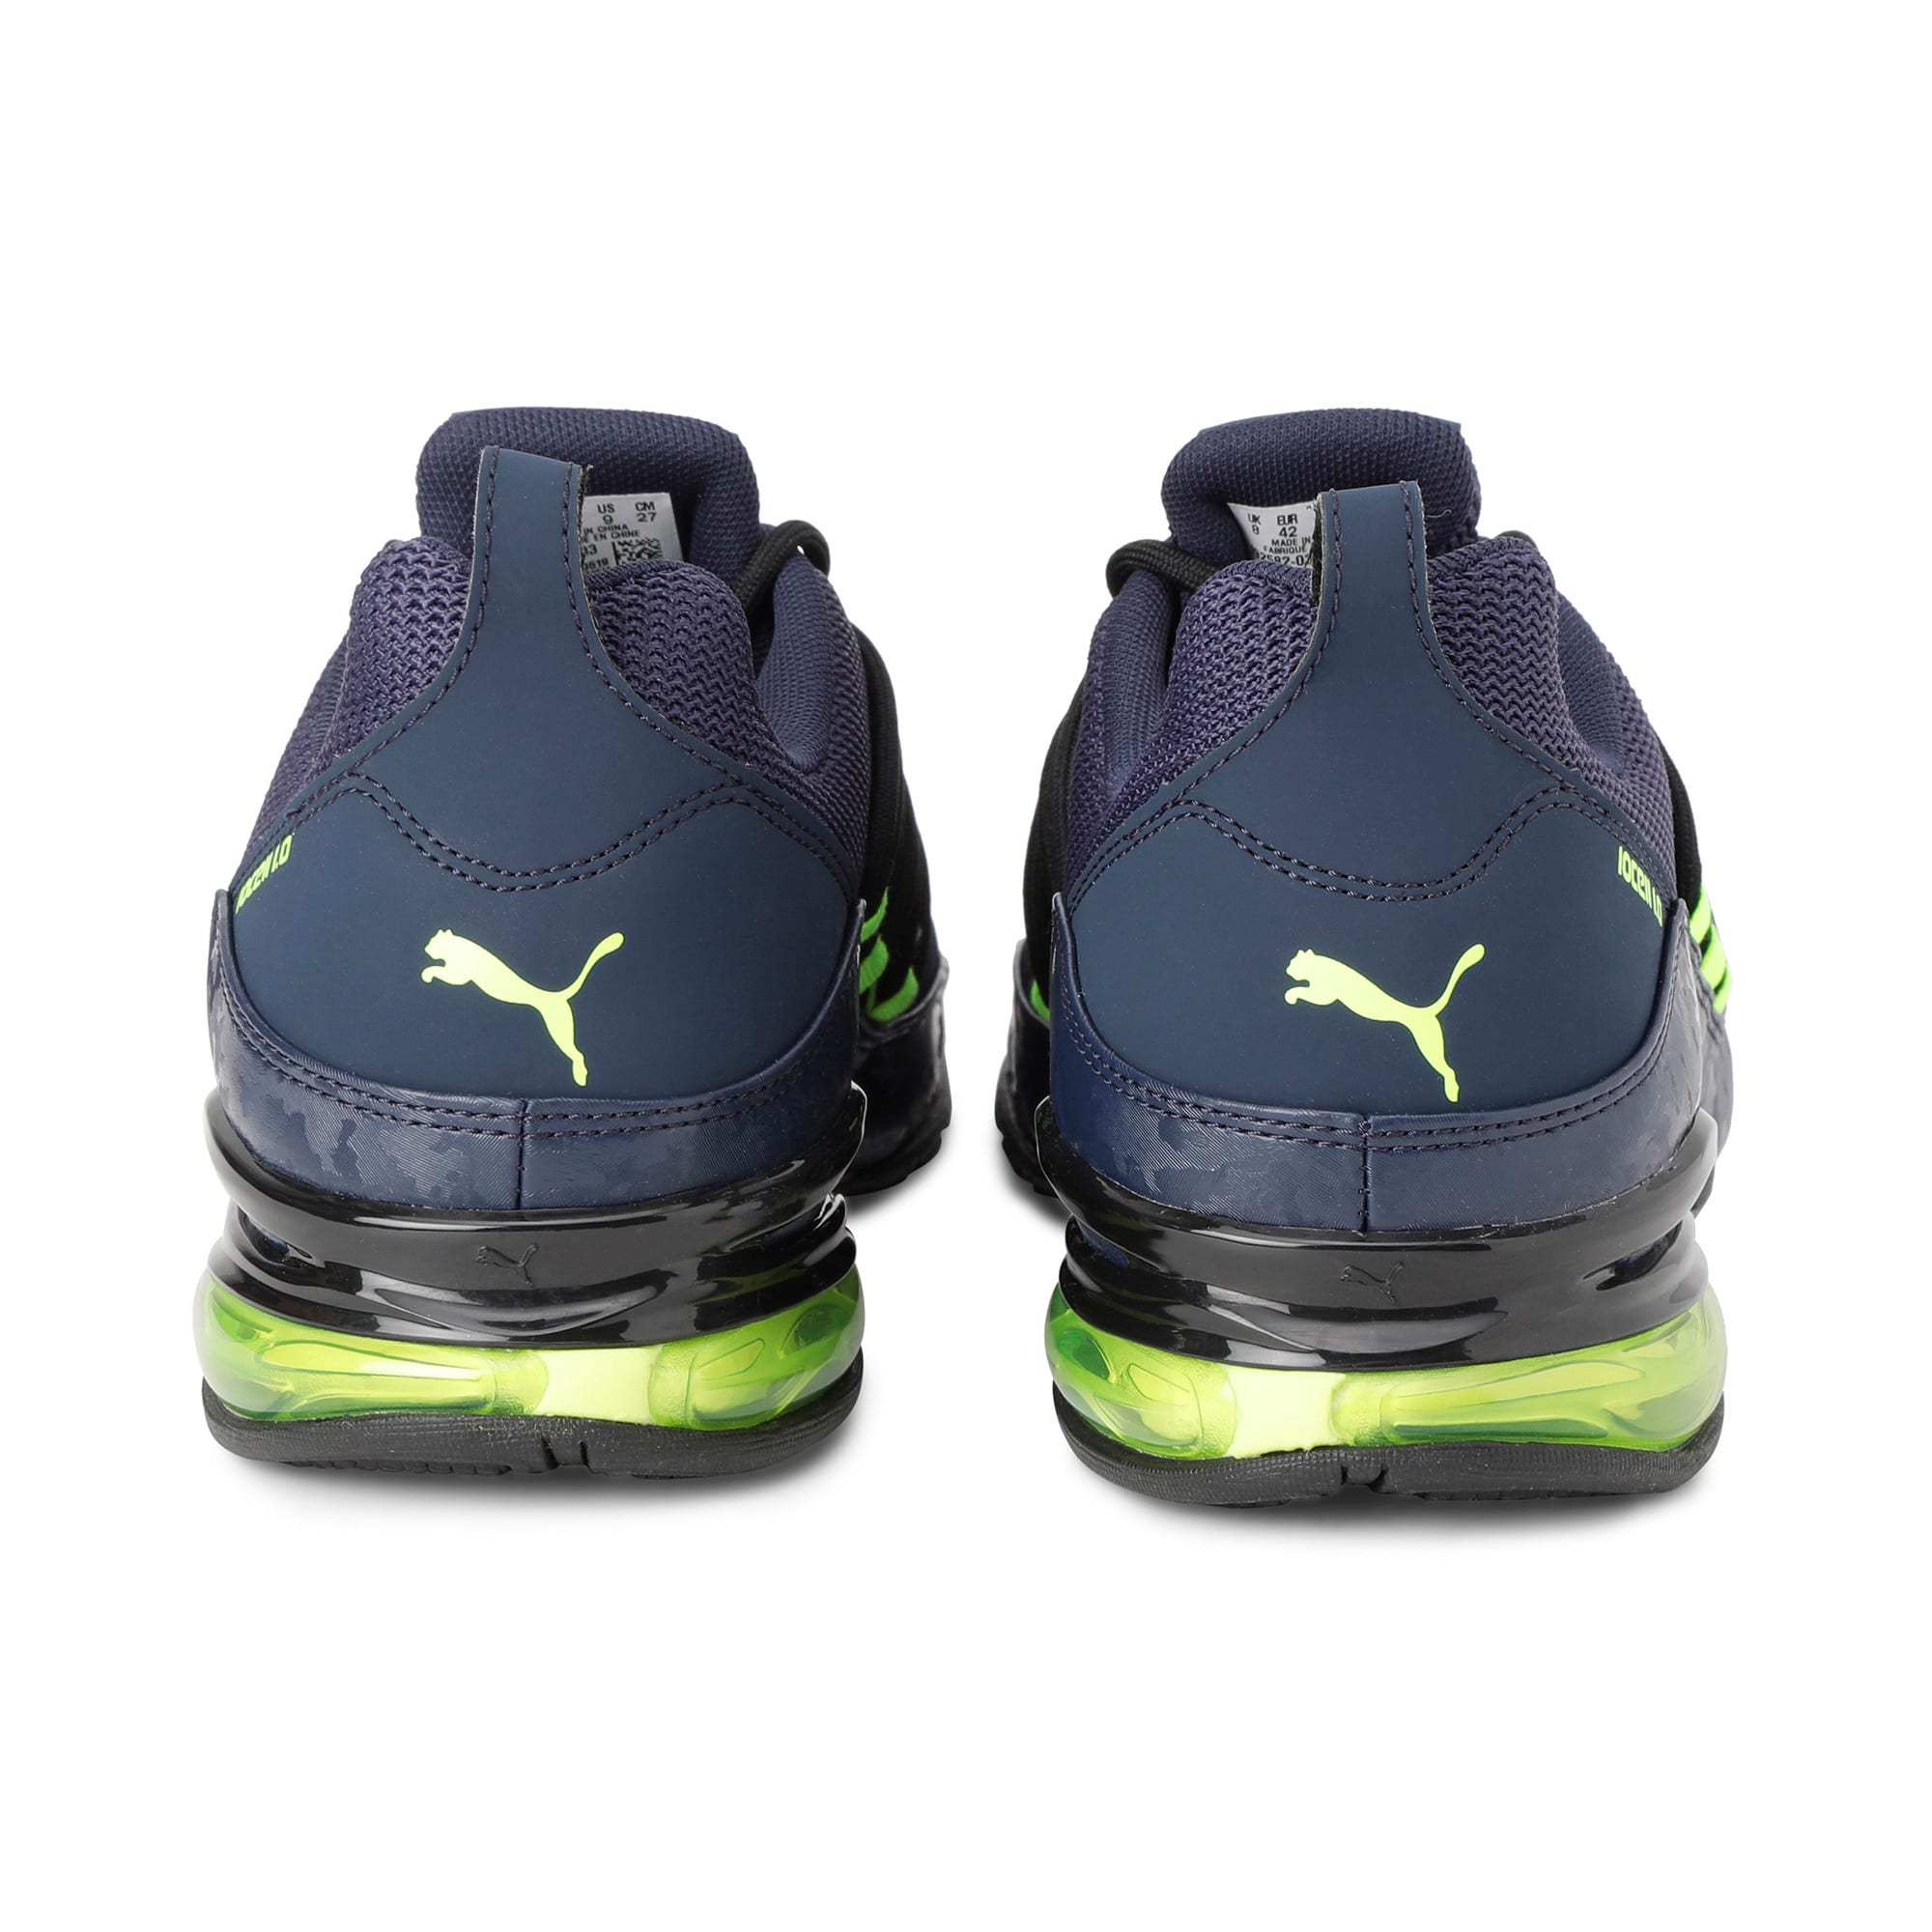 Thumbnail 5 of Cell Regulate Camo Men's Running Shoes, Peacoat-Yellow Alert, medium-IND